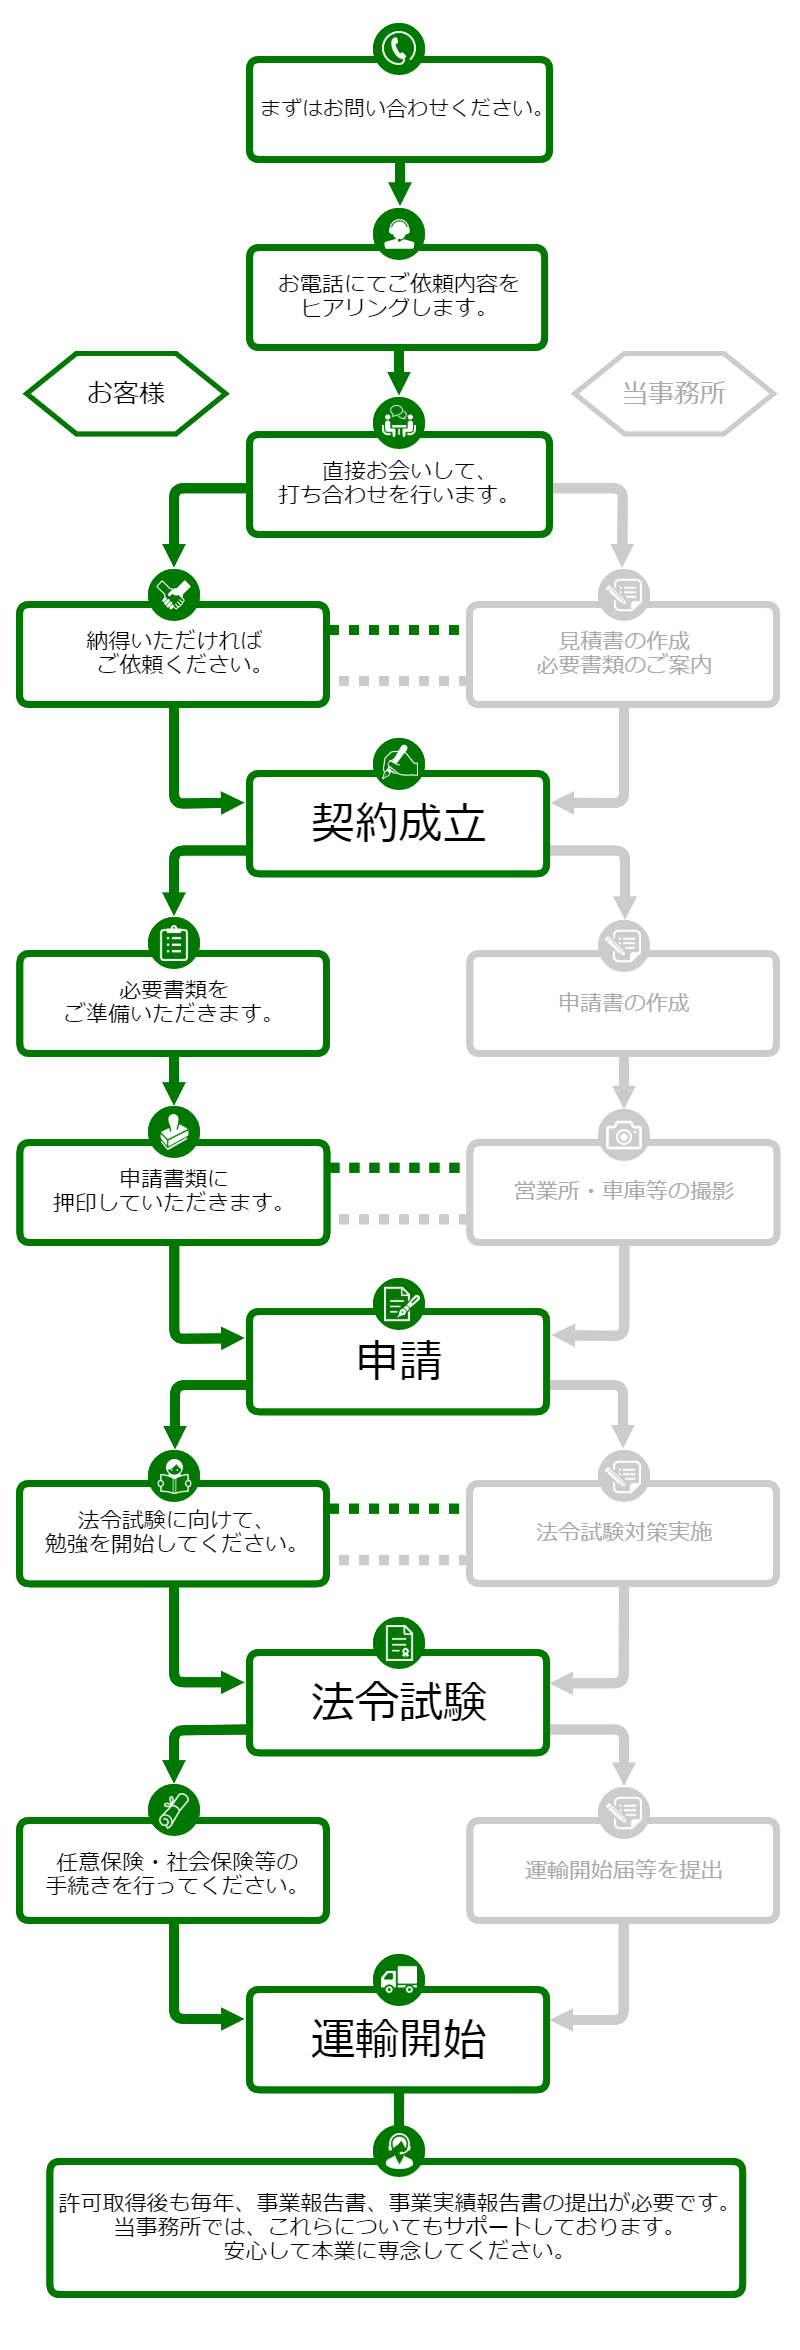 ご依頼の流れ|大阪の運送業特化行政書士 堀内法務事務所